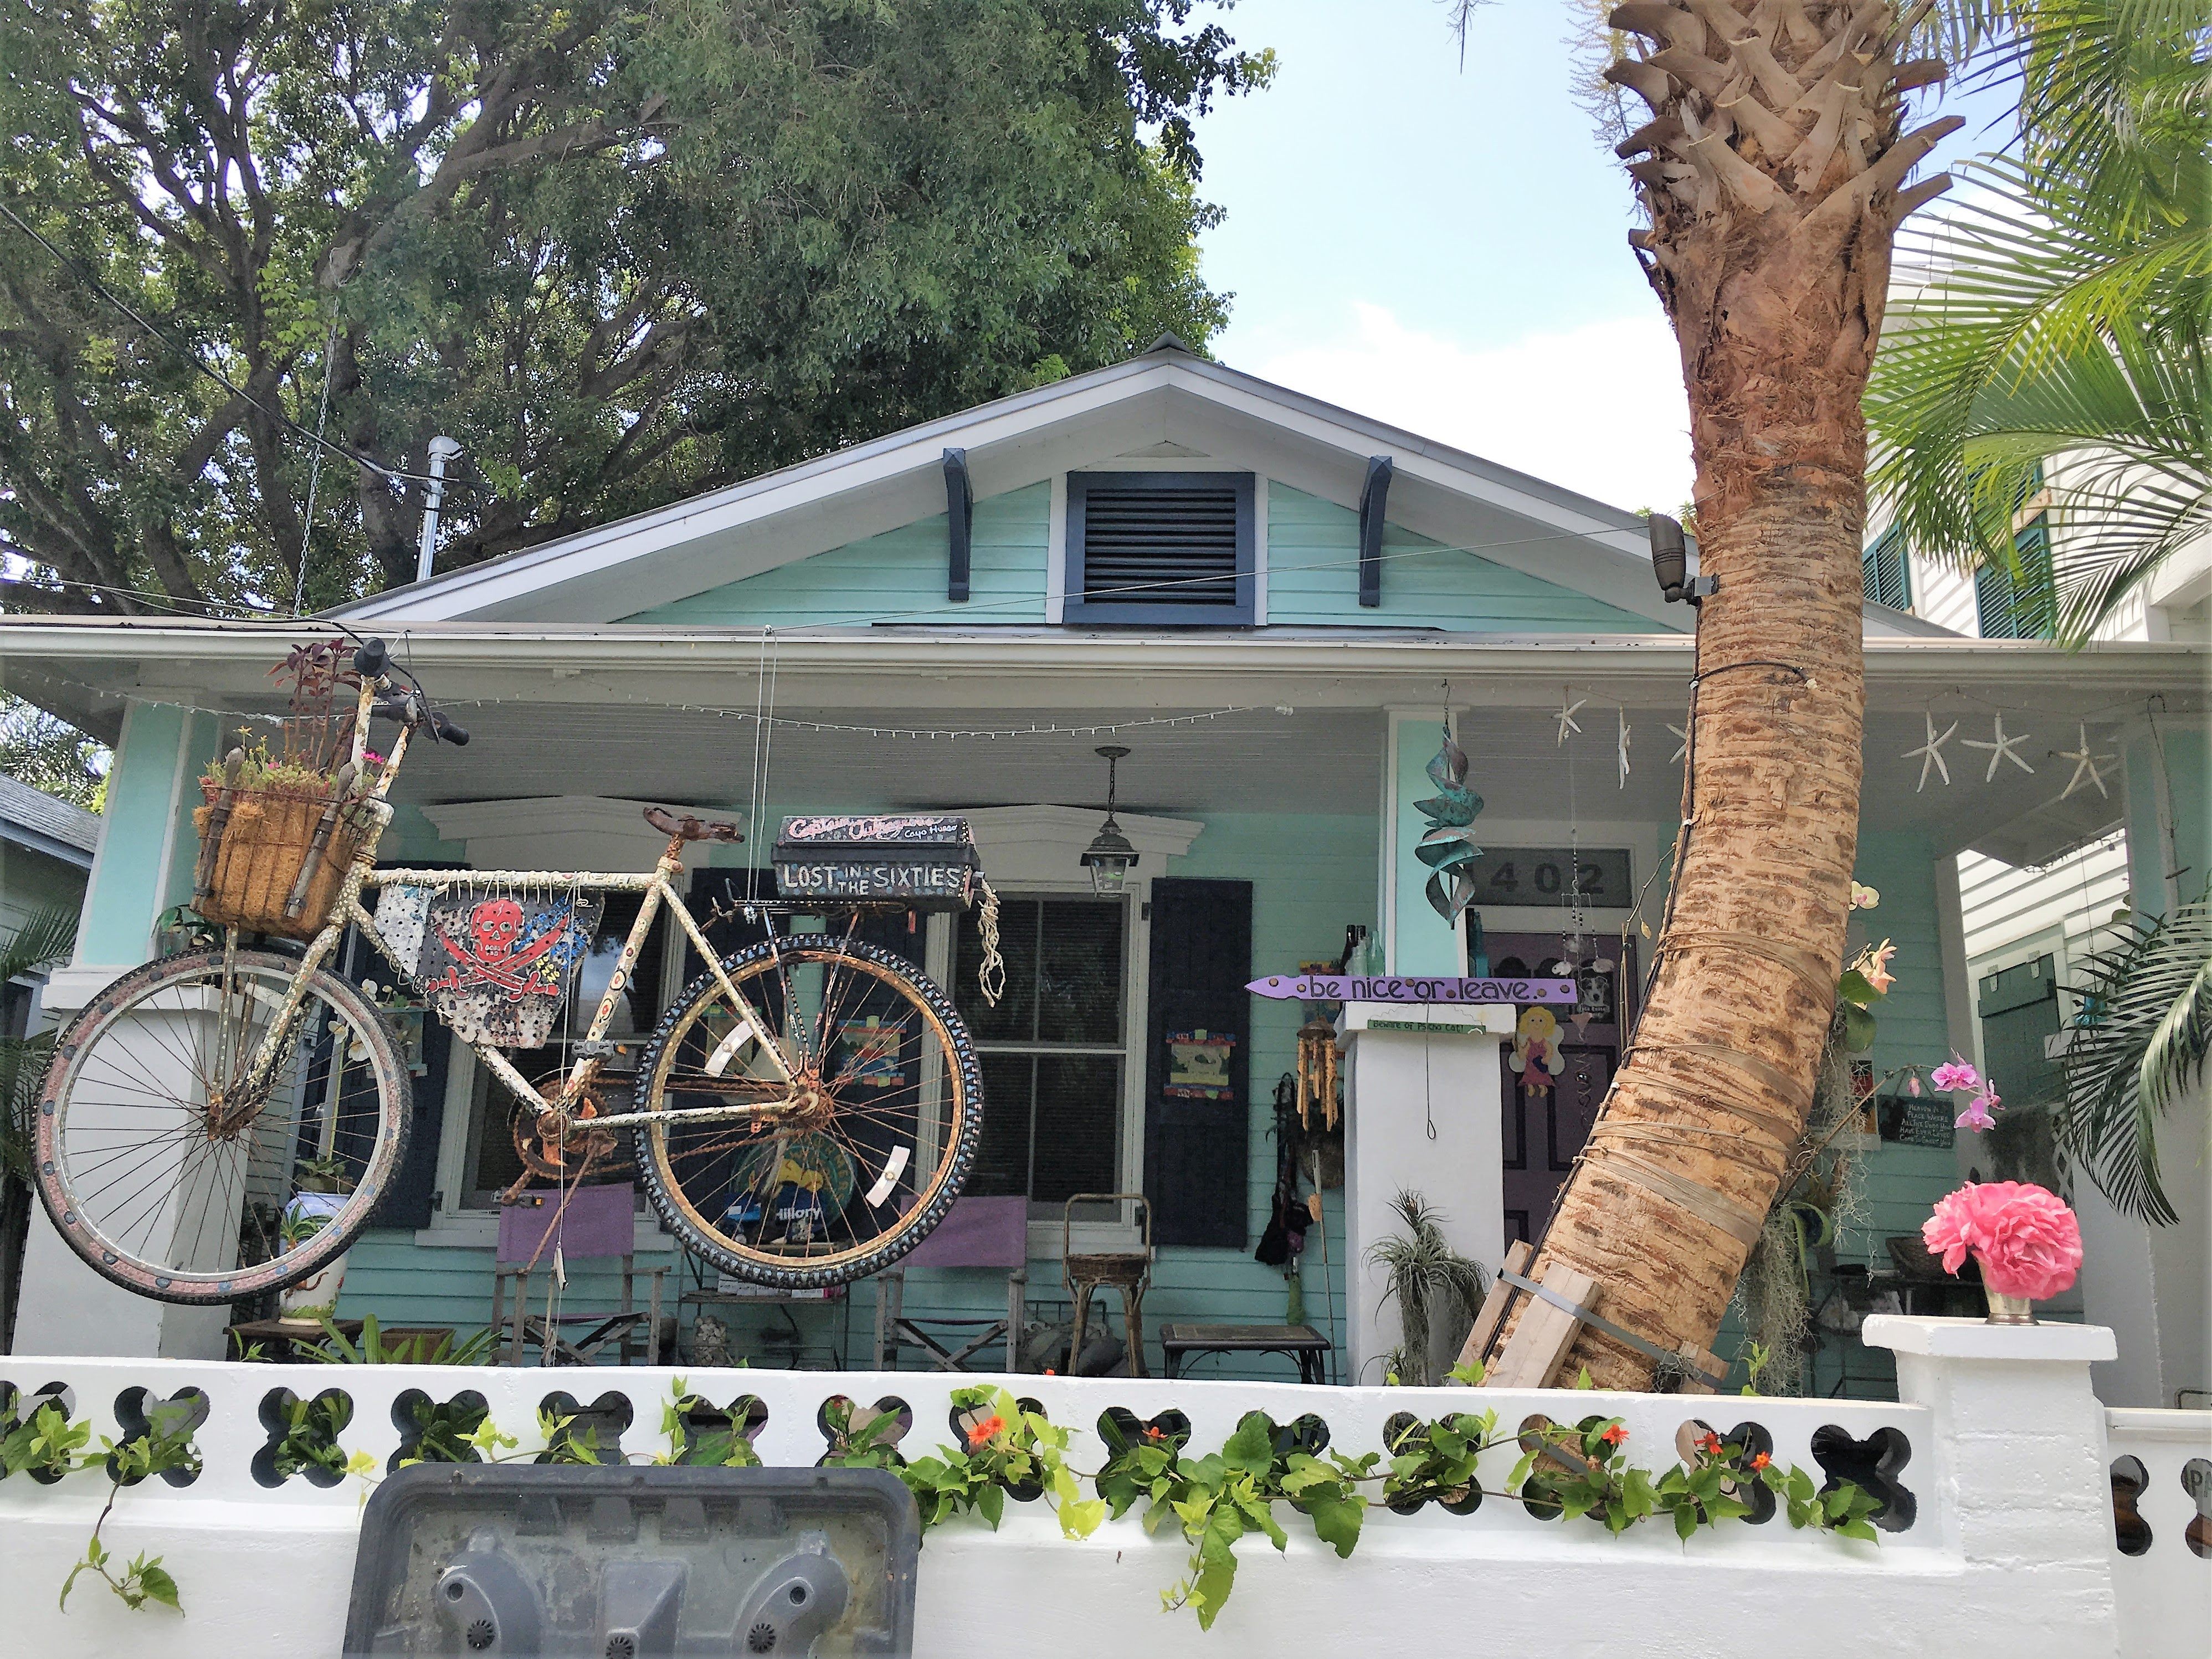 Rhoda Van Leer | 305.587.3021 | Rhoda.KeyWestLuxuryRealEstateInc.com